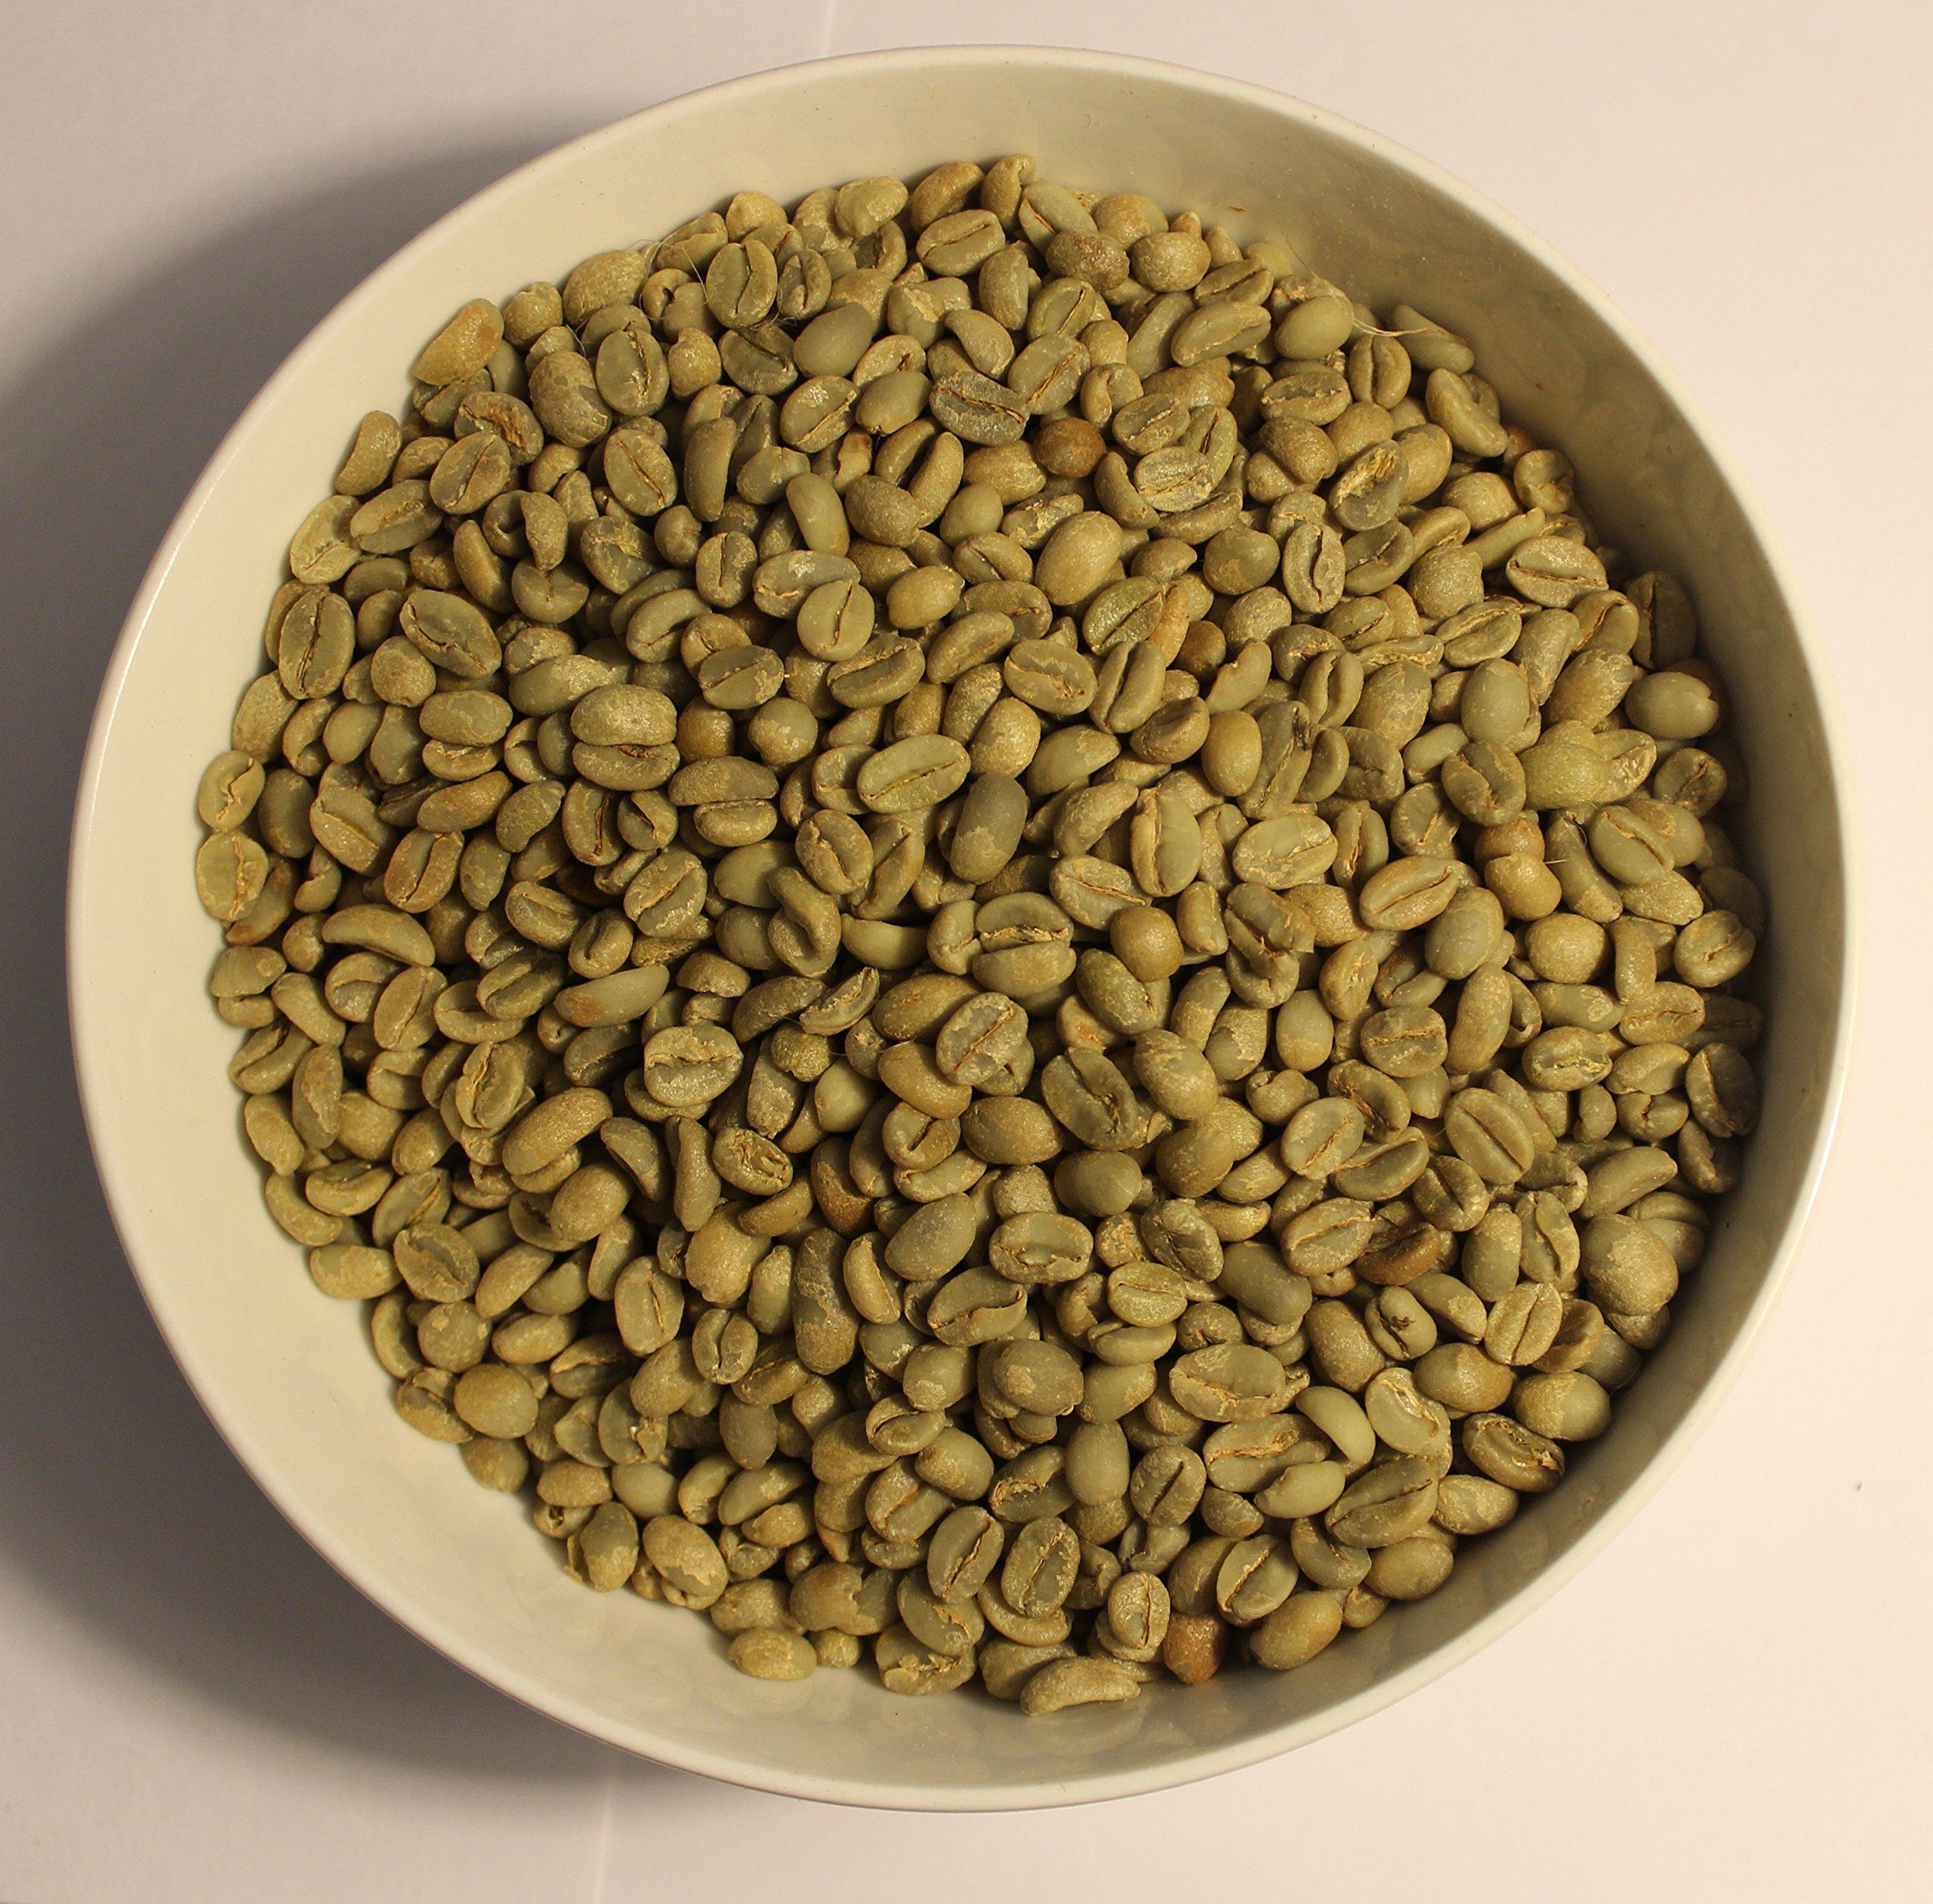 Ethiopia Yirgacheffe - Natural, Kochere Chelelektu - top Grade 1, Green (Unroasted) Coffee Beans, (18 Pounds)